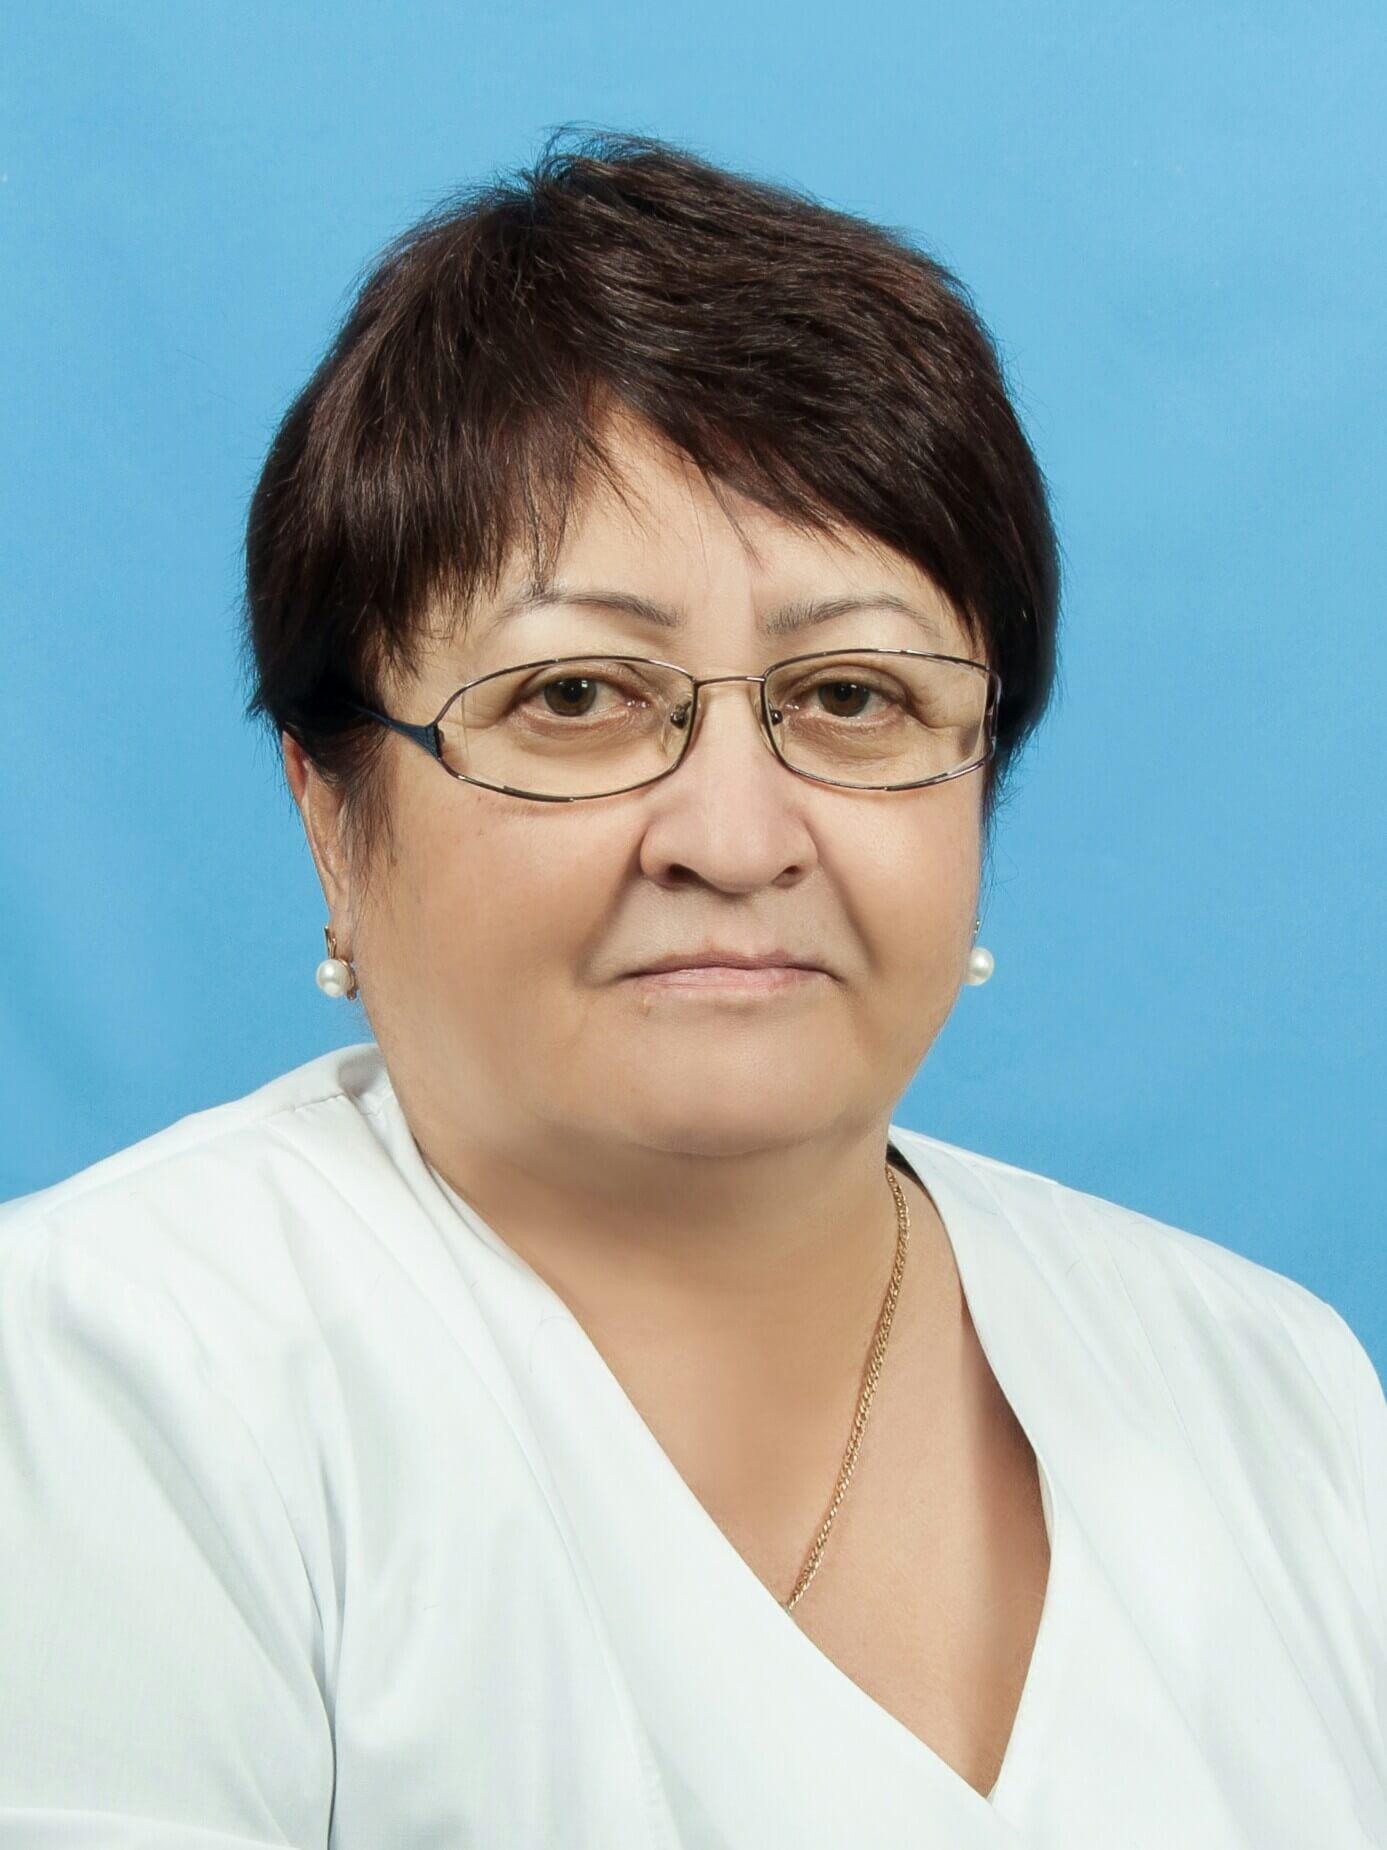 Врач гинеколог Гоменюк С.Н.